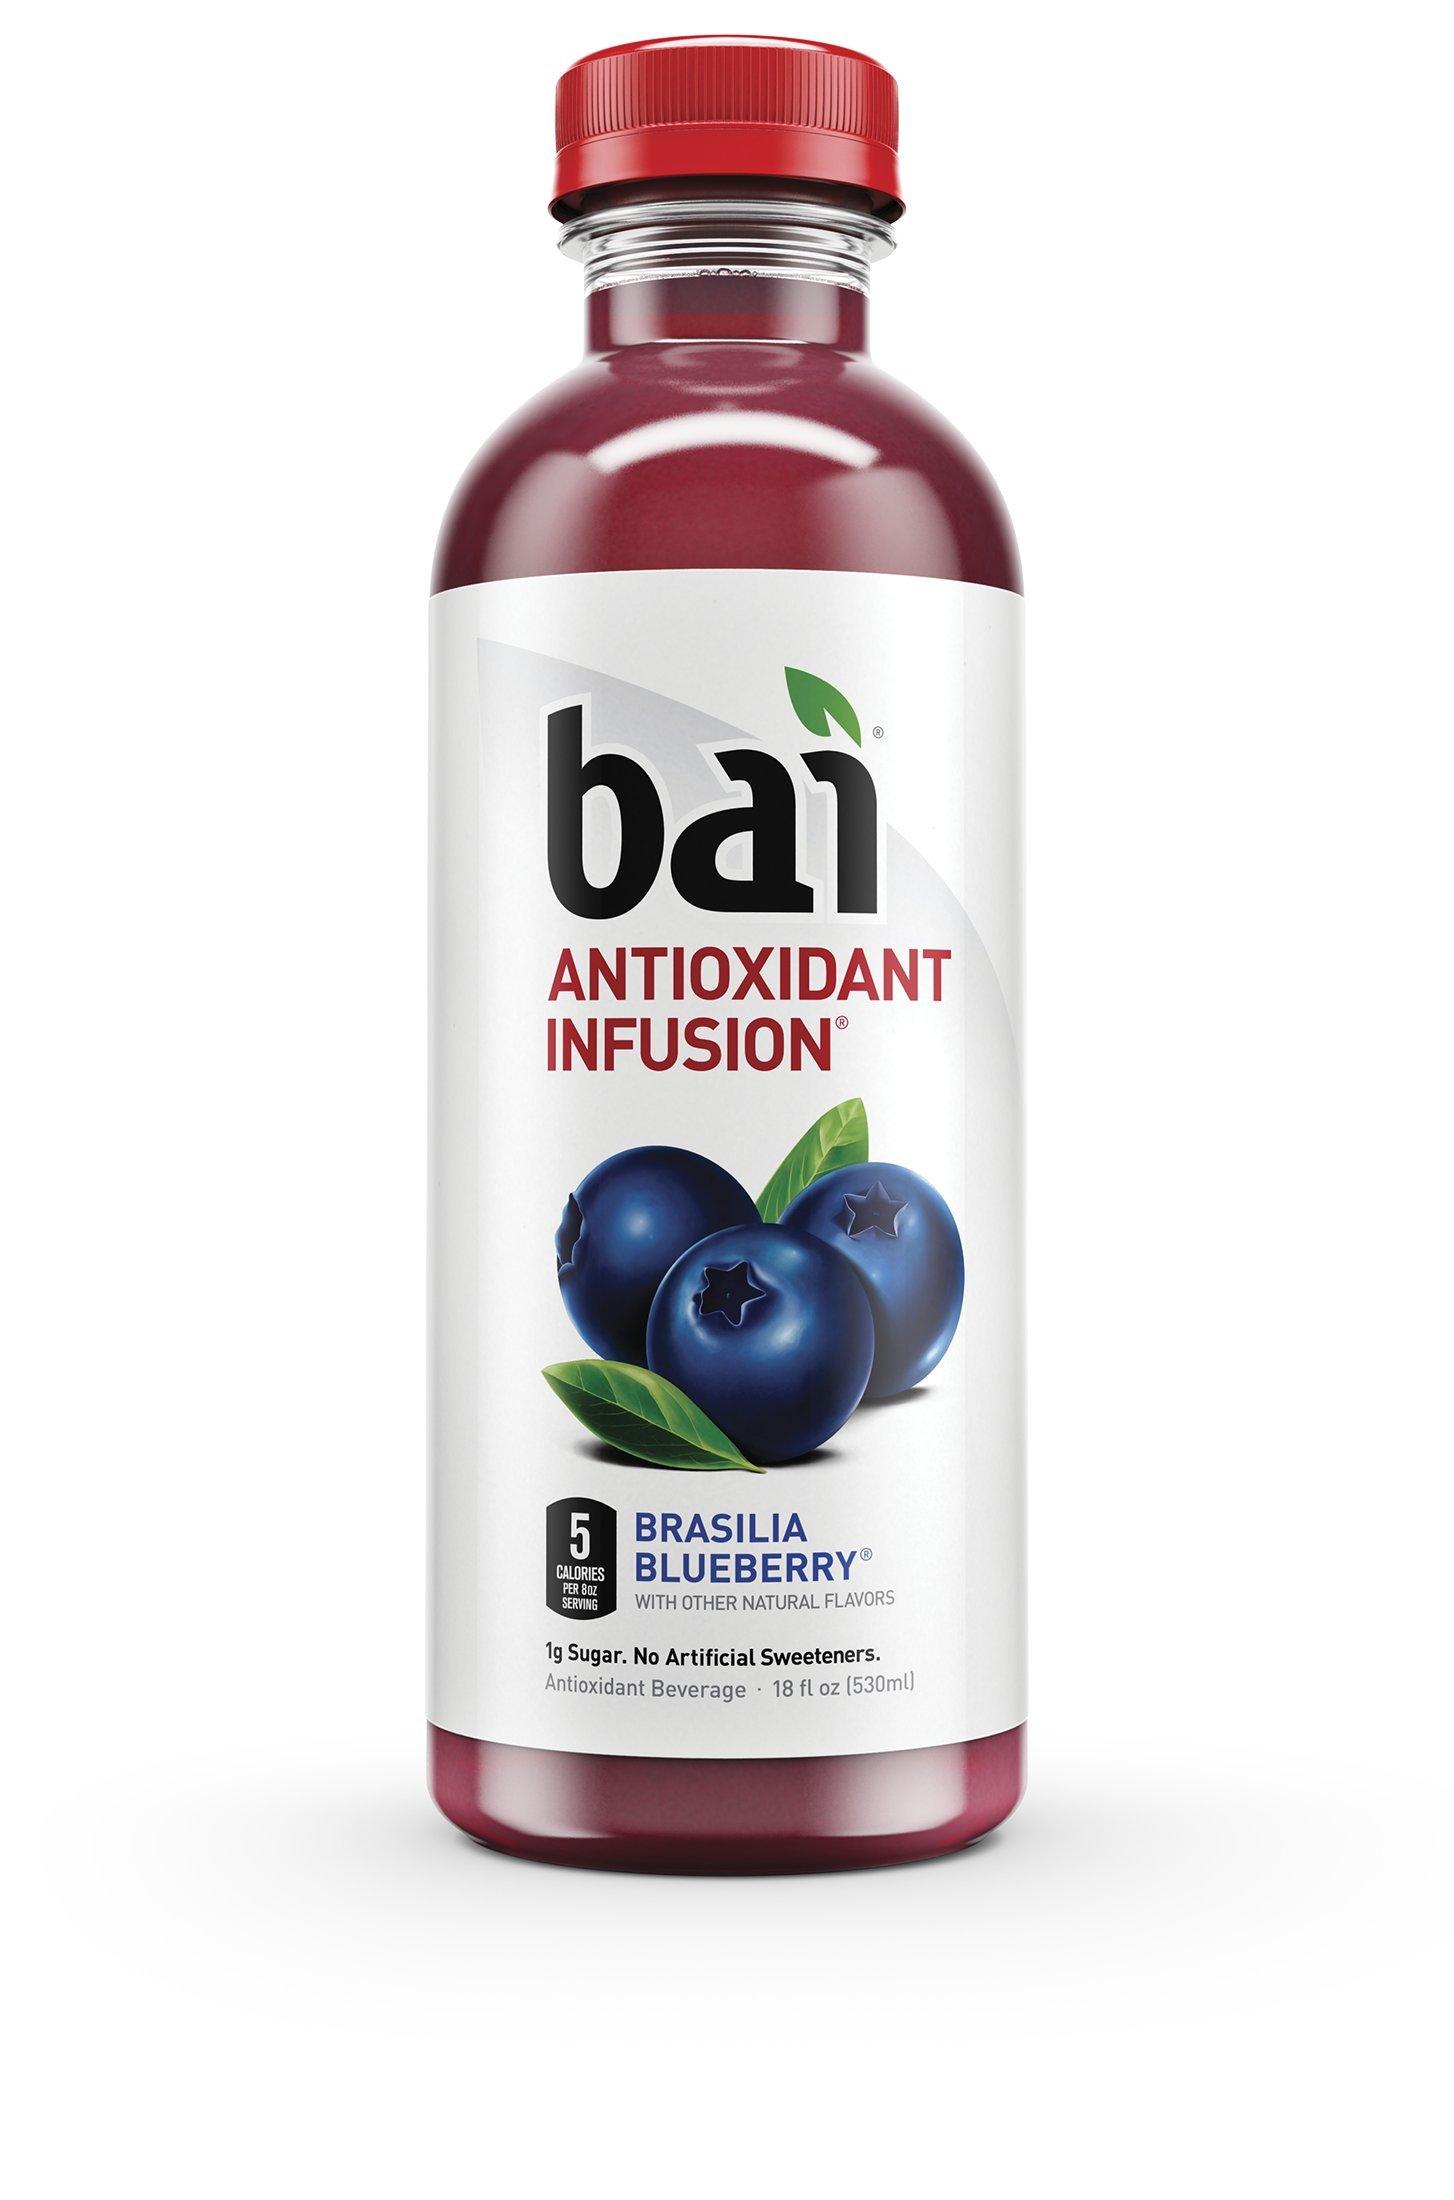 Bai Brasilia Blueberry, Antioxidant Infused Beverage, 18 Fluid Ounce Bottles, 12 count